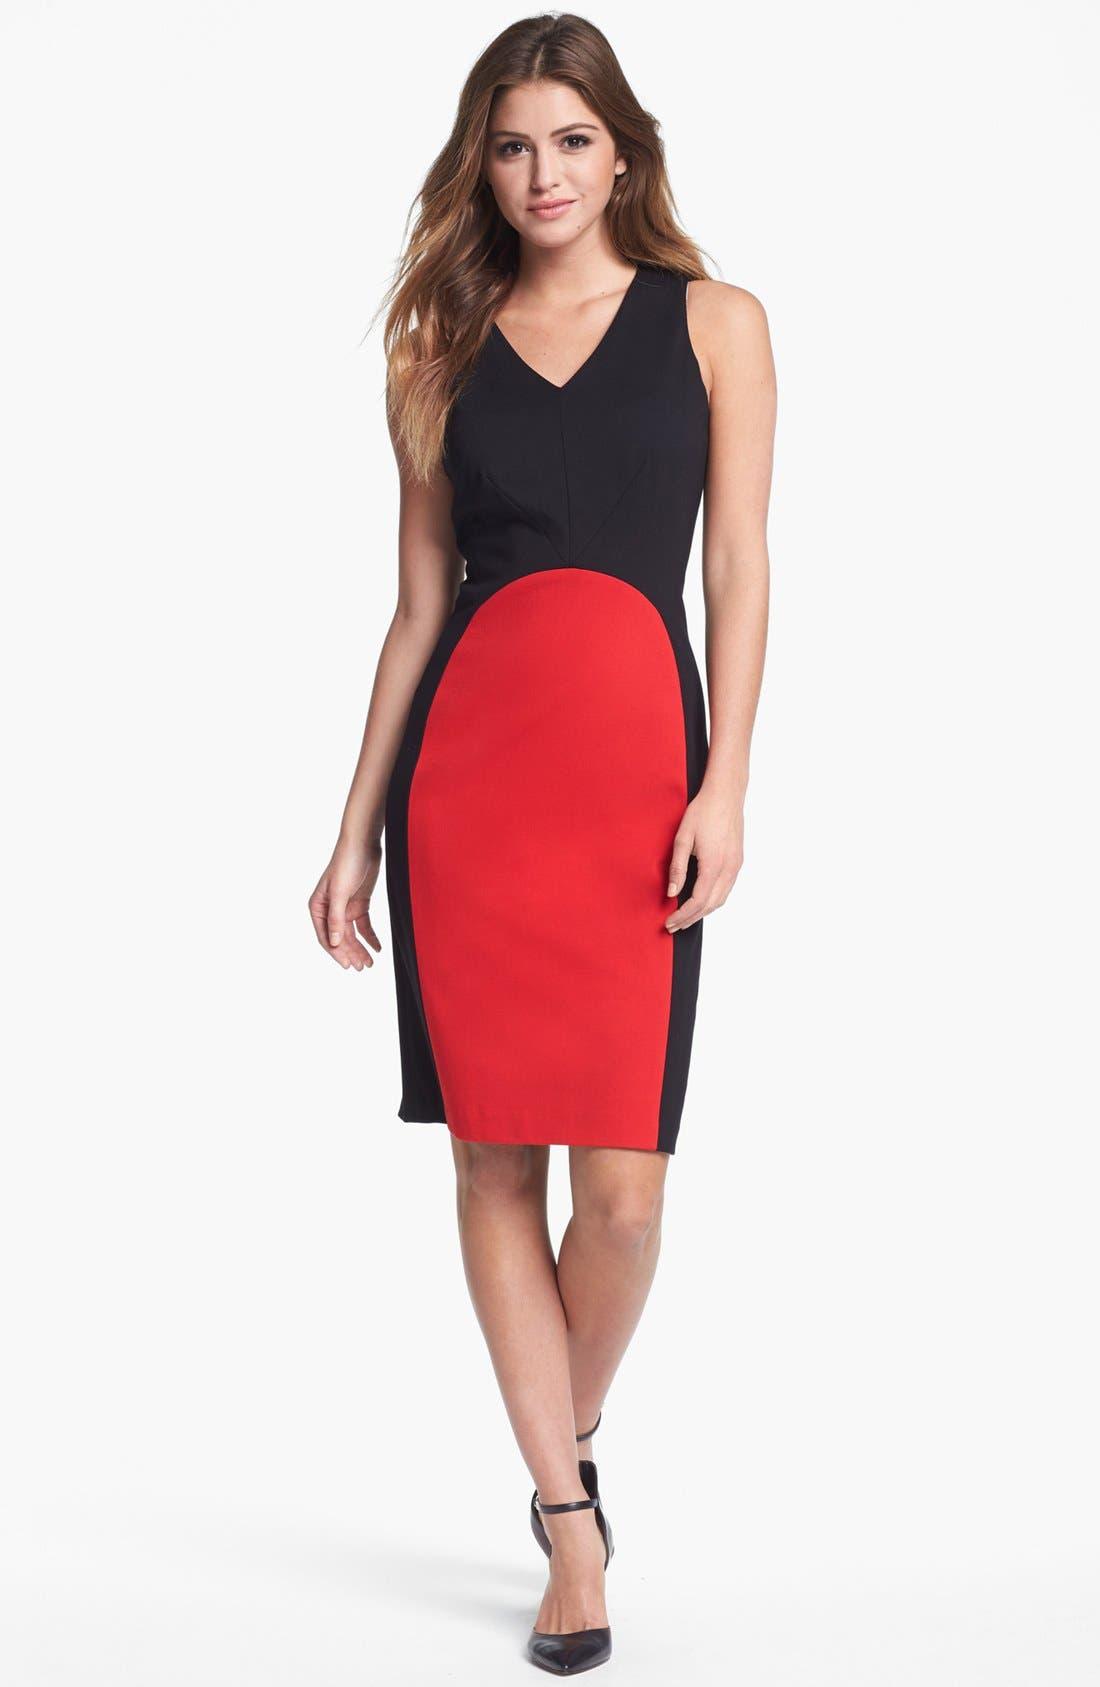 Main Image - Vince Camuto Colorblock V-Neck Sheath Dress (Regular & Petite) (Nordstrom Exclusive)